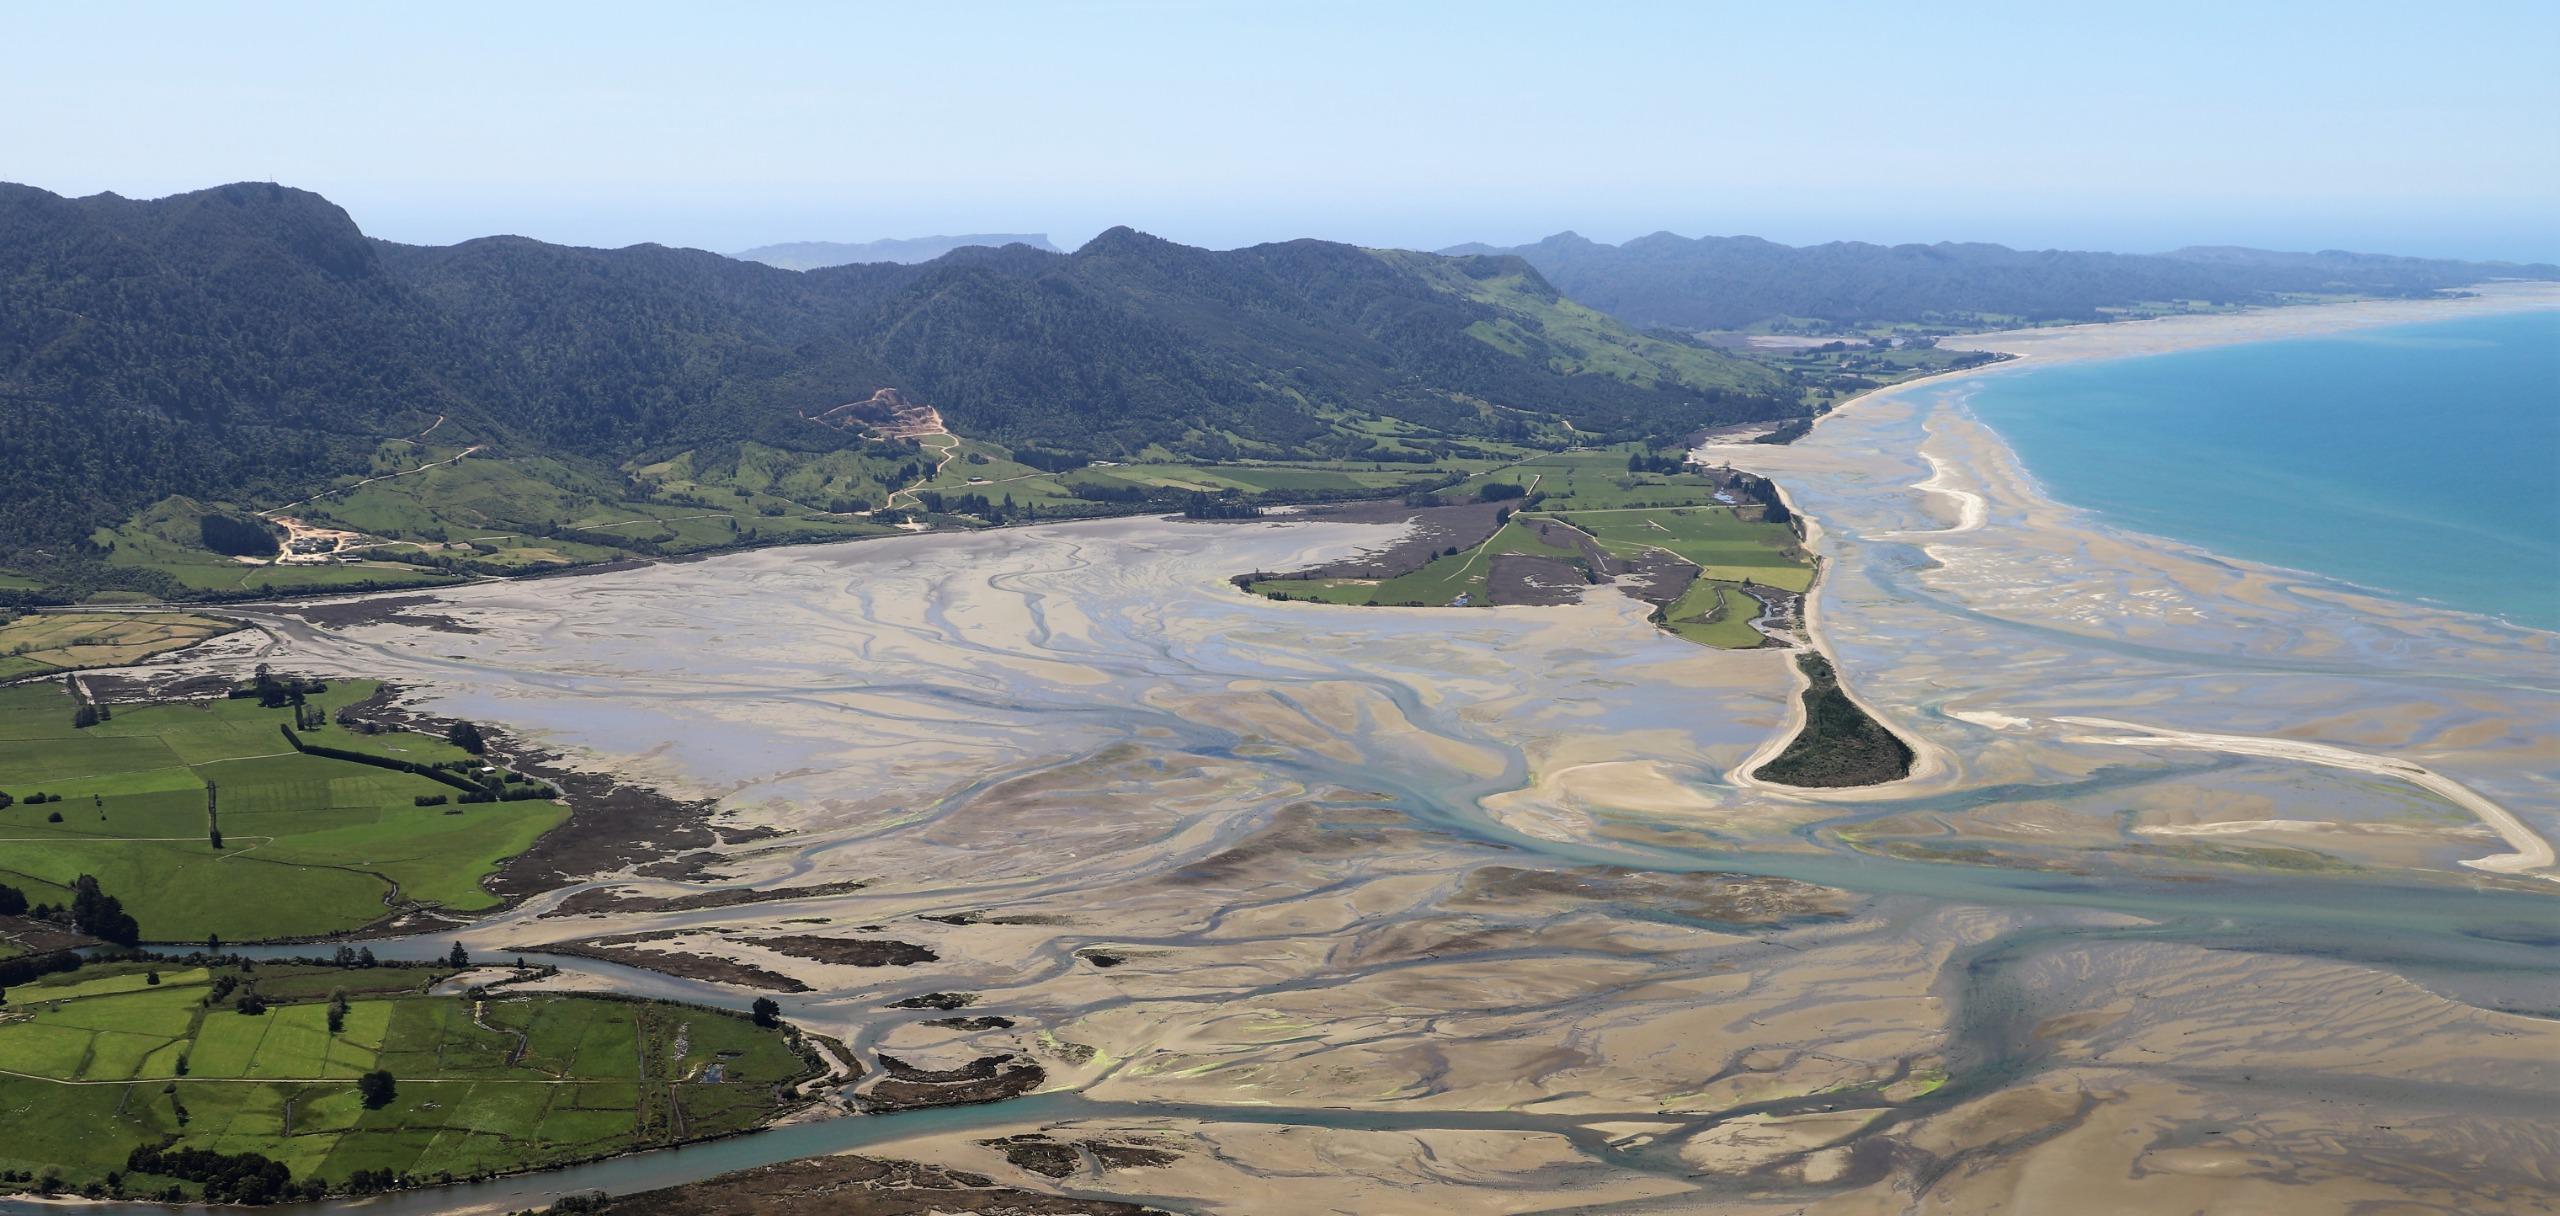 Landscapes and coastal environment